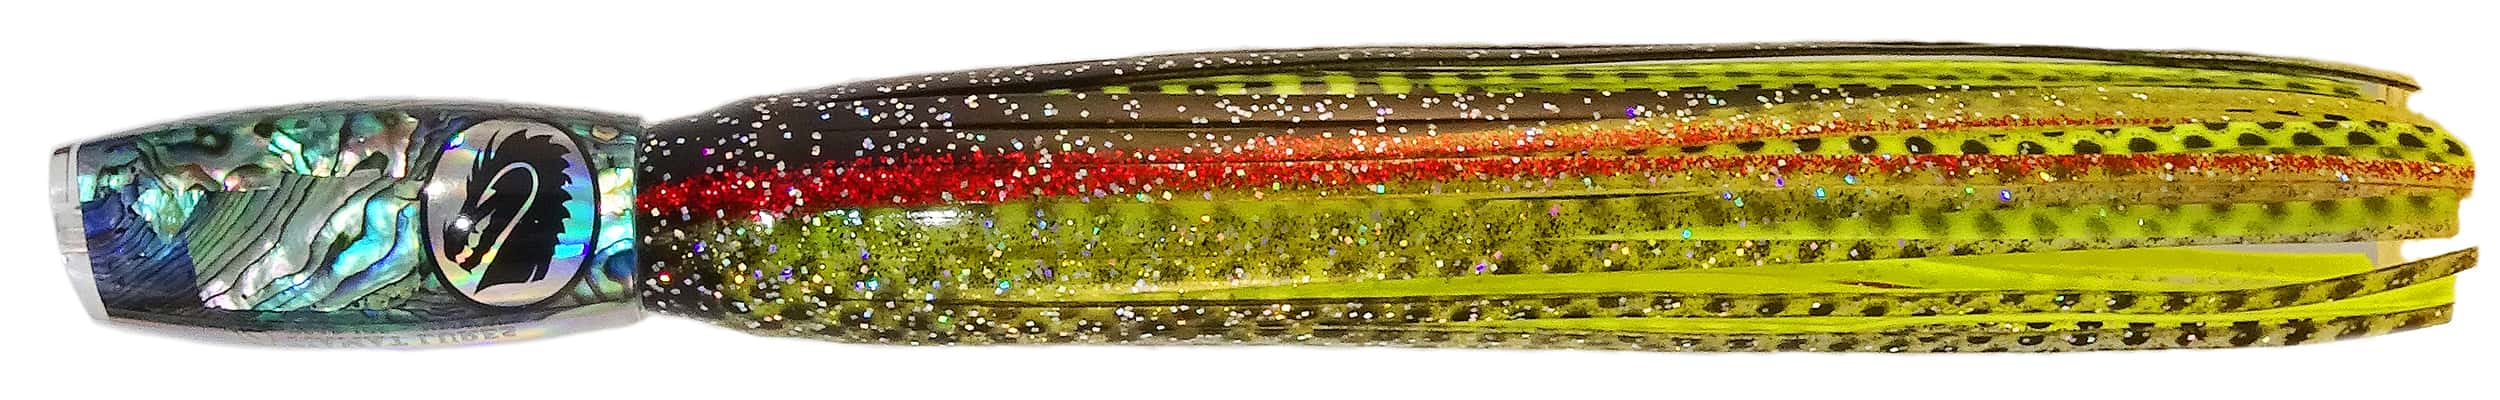 Tiamat Lures - Skirt Colour Scheme 01 - Ahi - OTLS08 - ITLS18